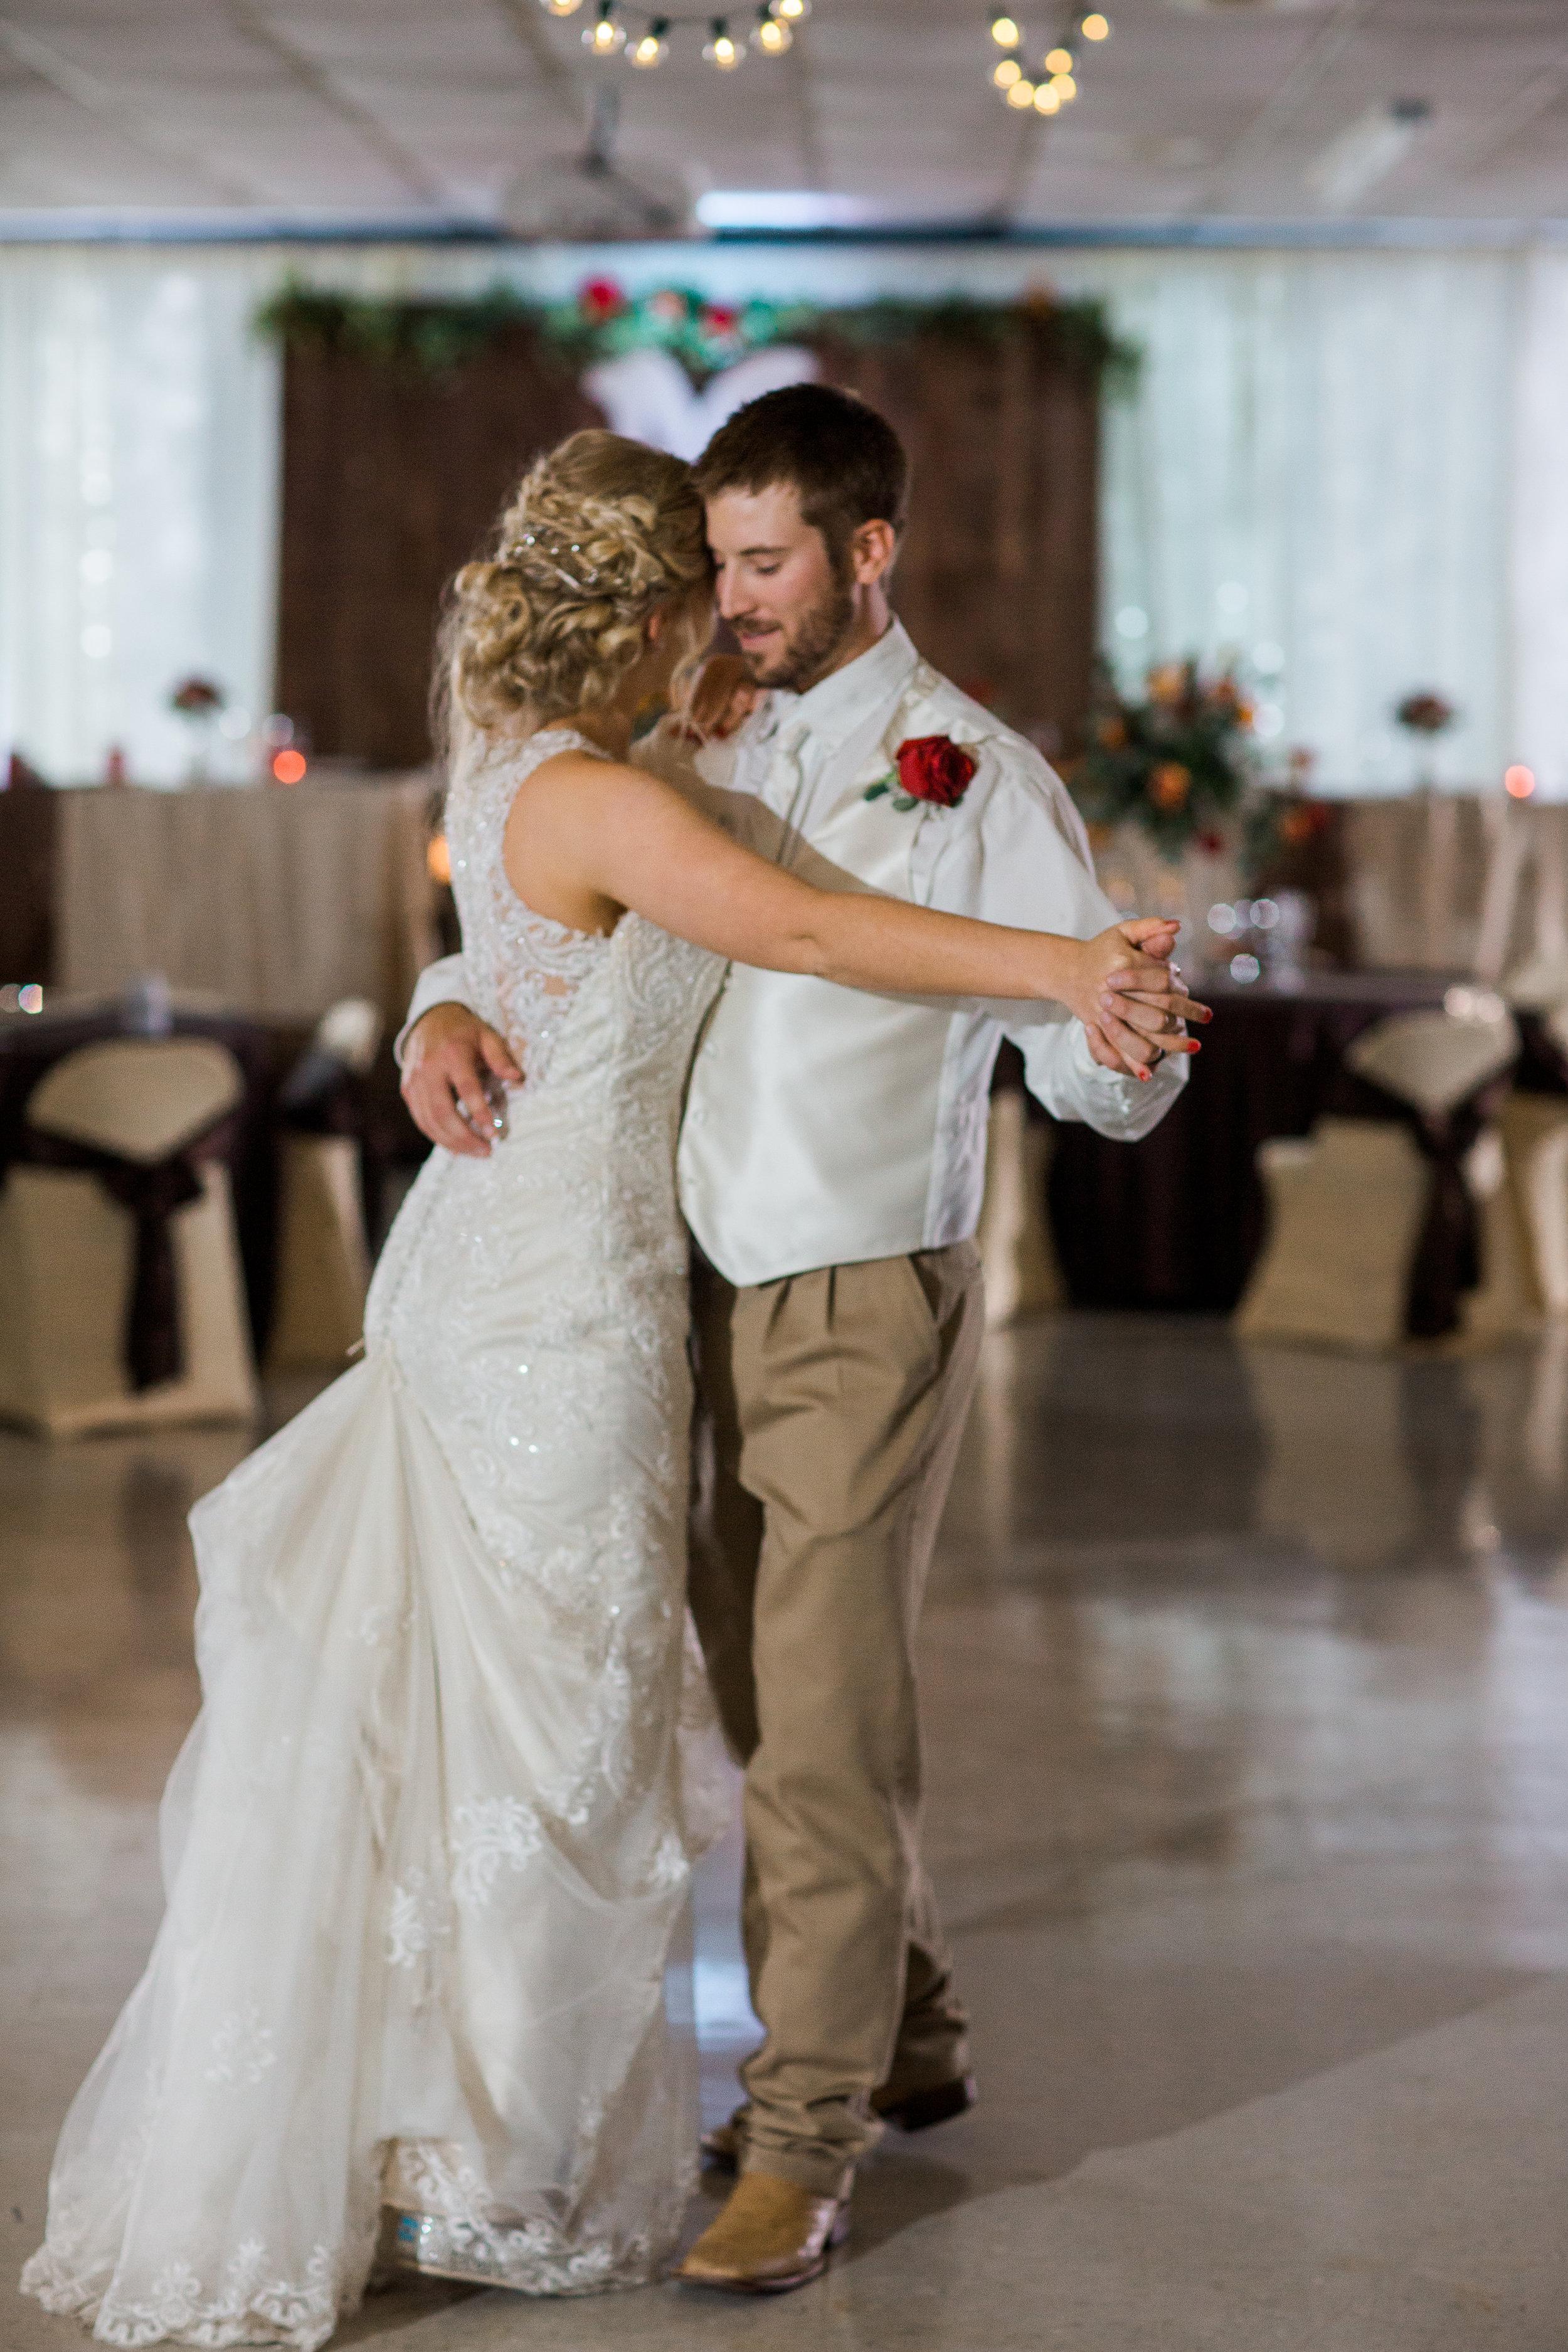 Bailey-Nathan-Windthorst-Texas-Wedding-067.jpg